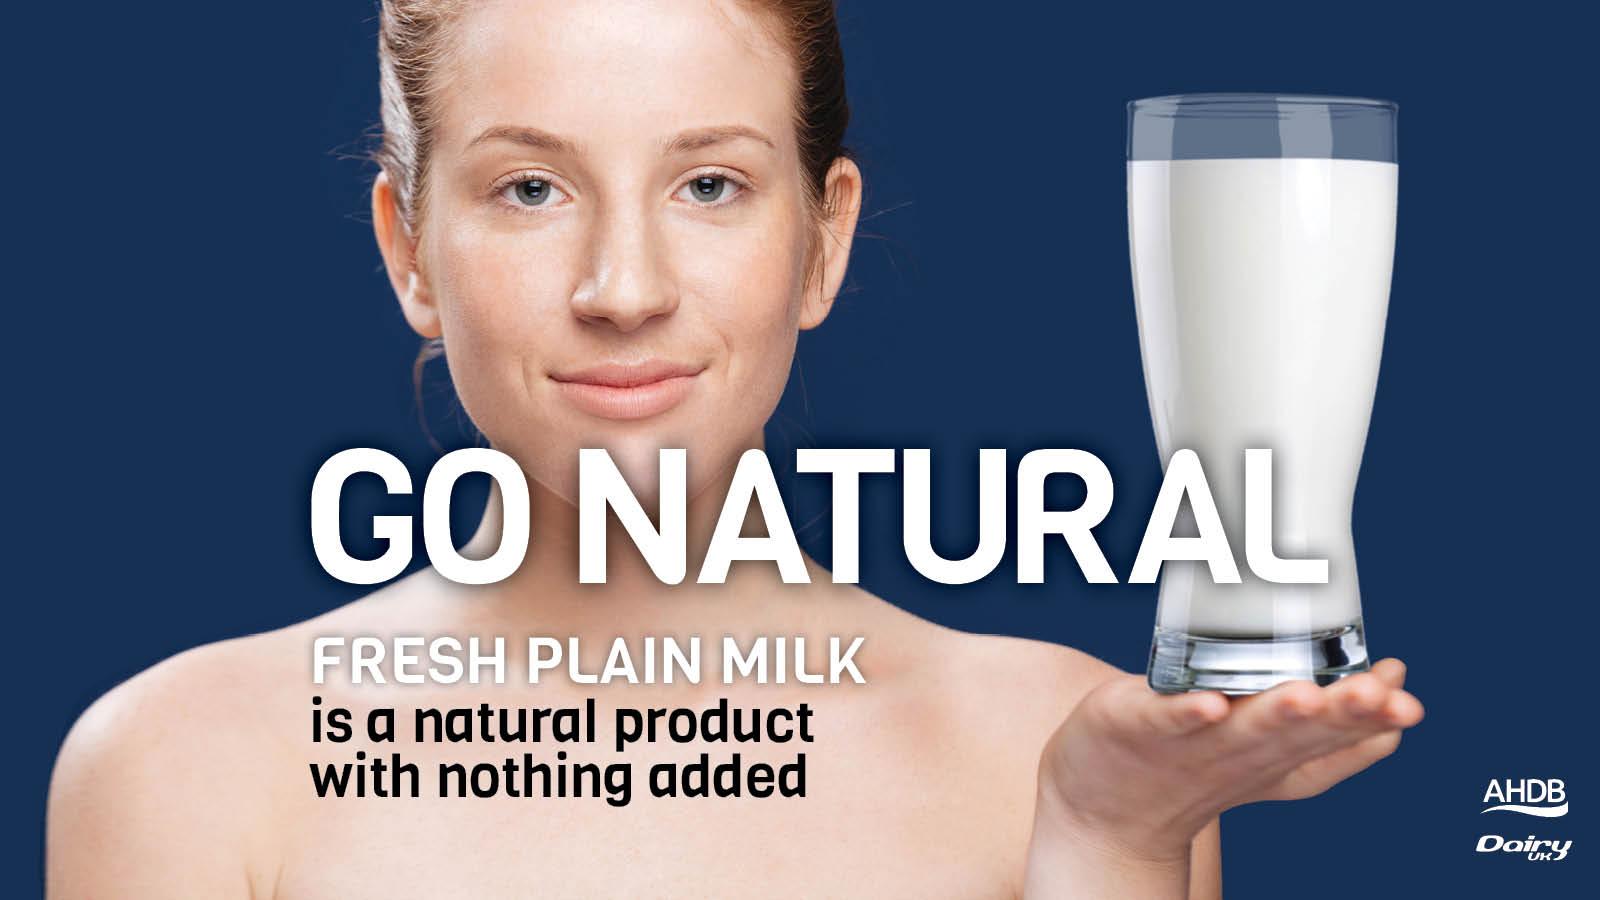 Go-natural.jpg